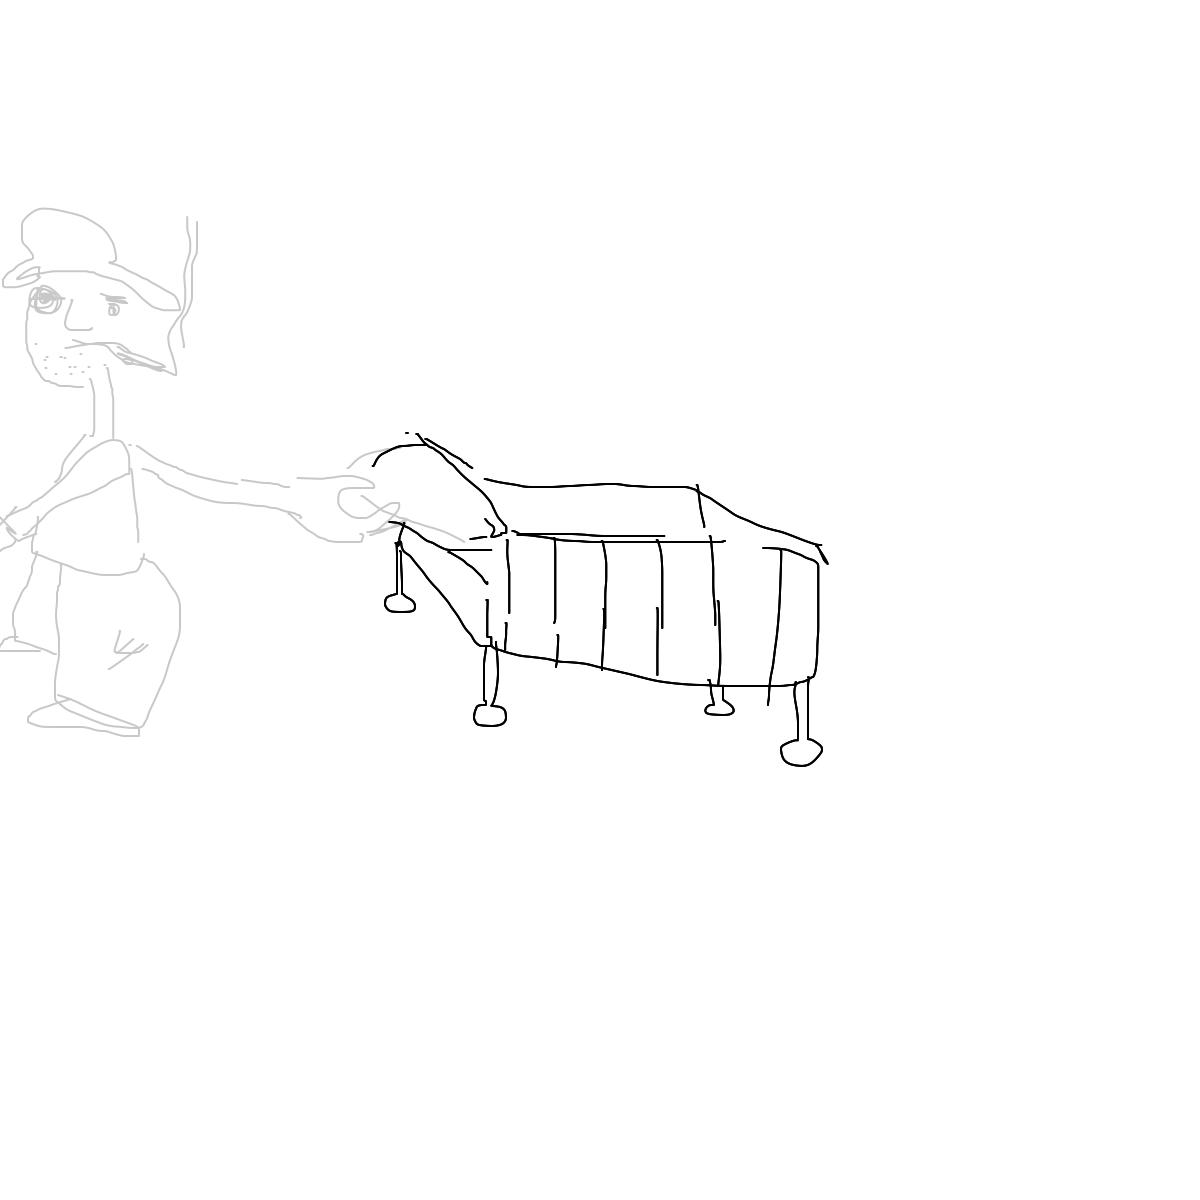 BAAAM drawing#3588 lat:44.0468063354492200lng: -123.0889511108398400